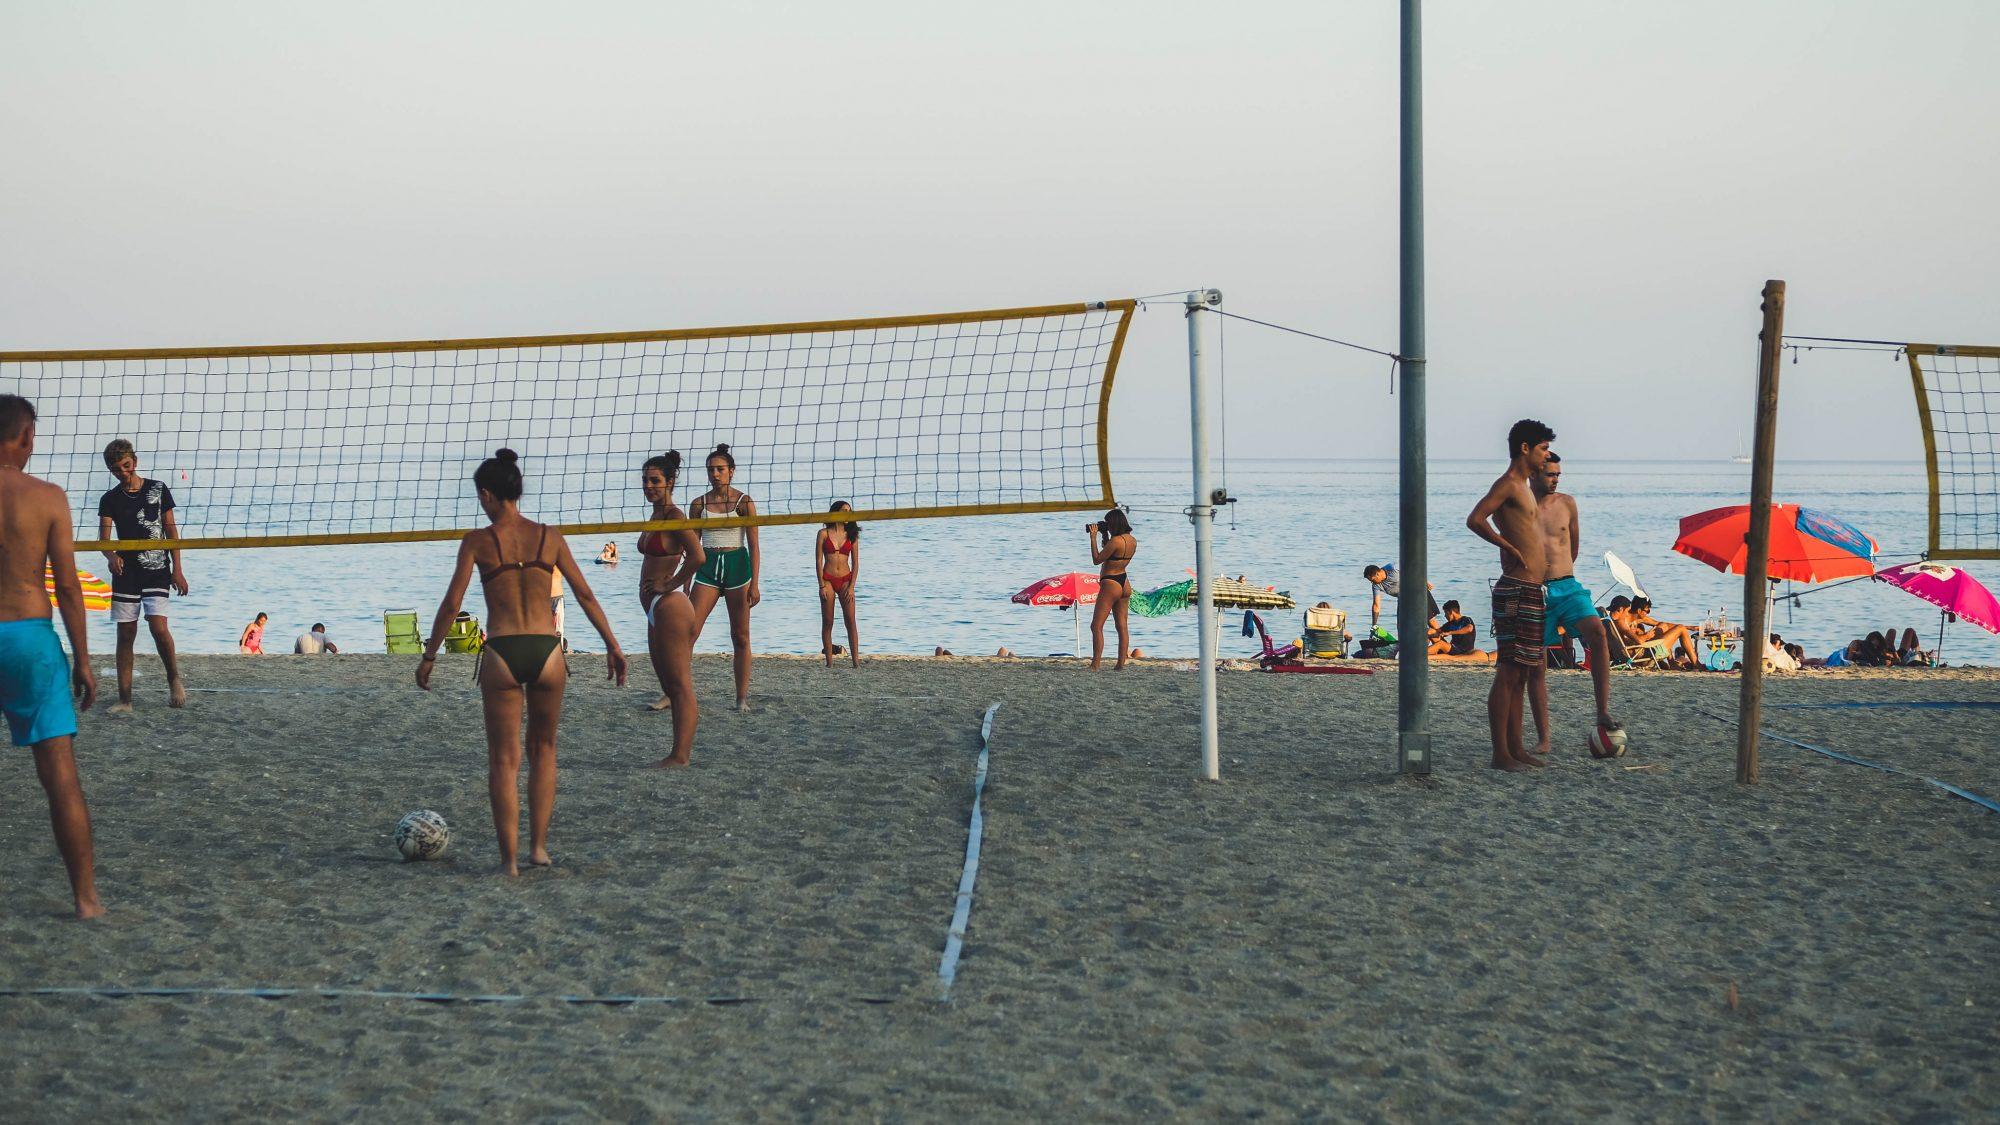 Compétition de Volley - Nerja, Espagne